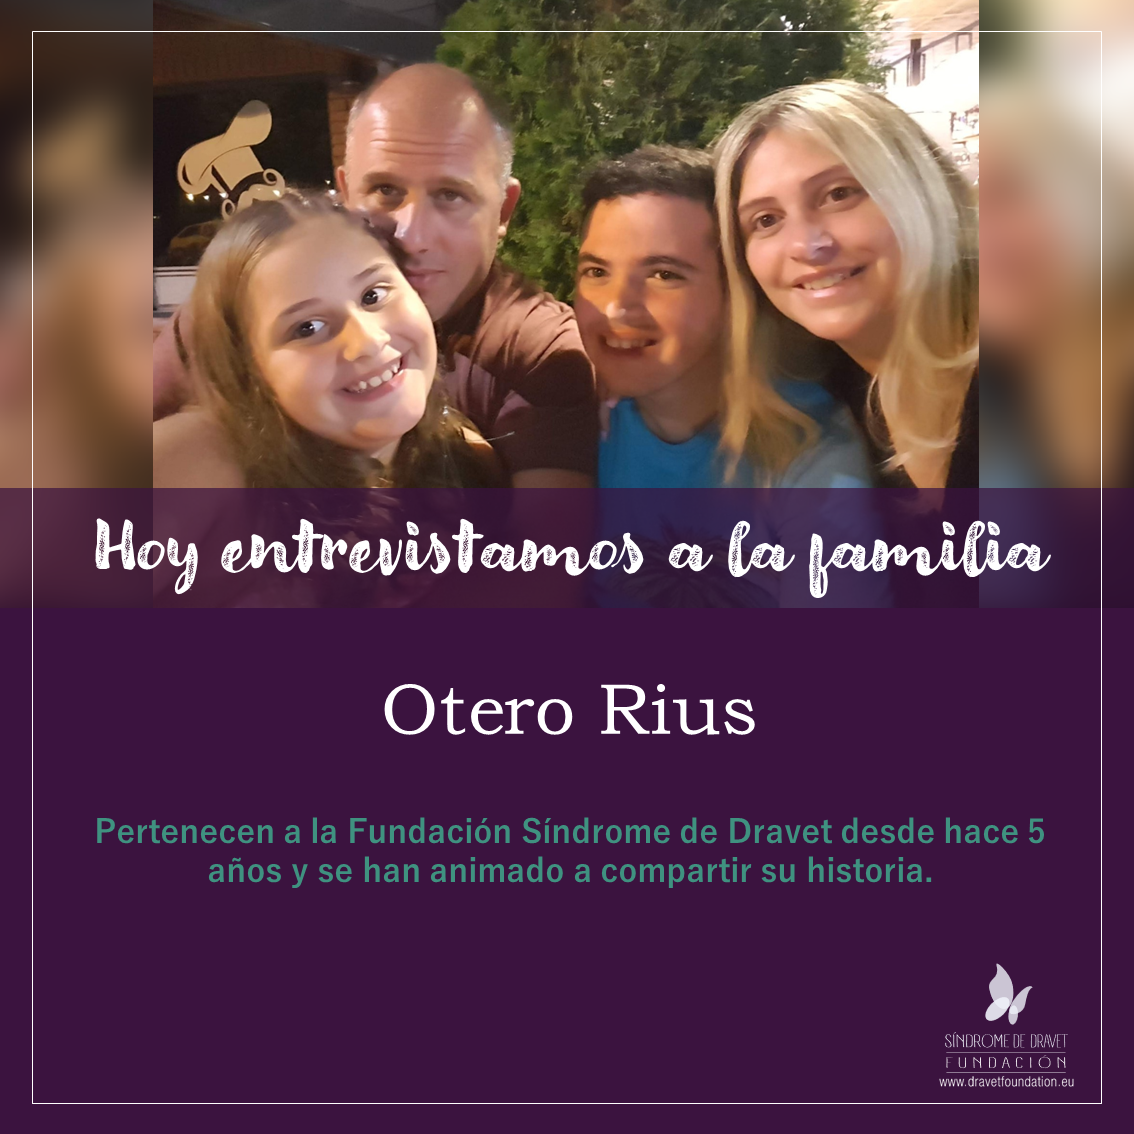 Entrevistamos a la familia Otero Rius